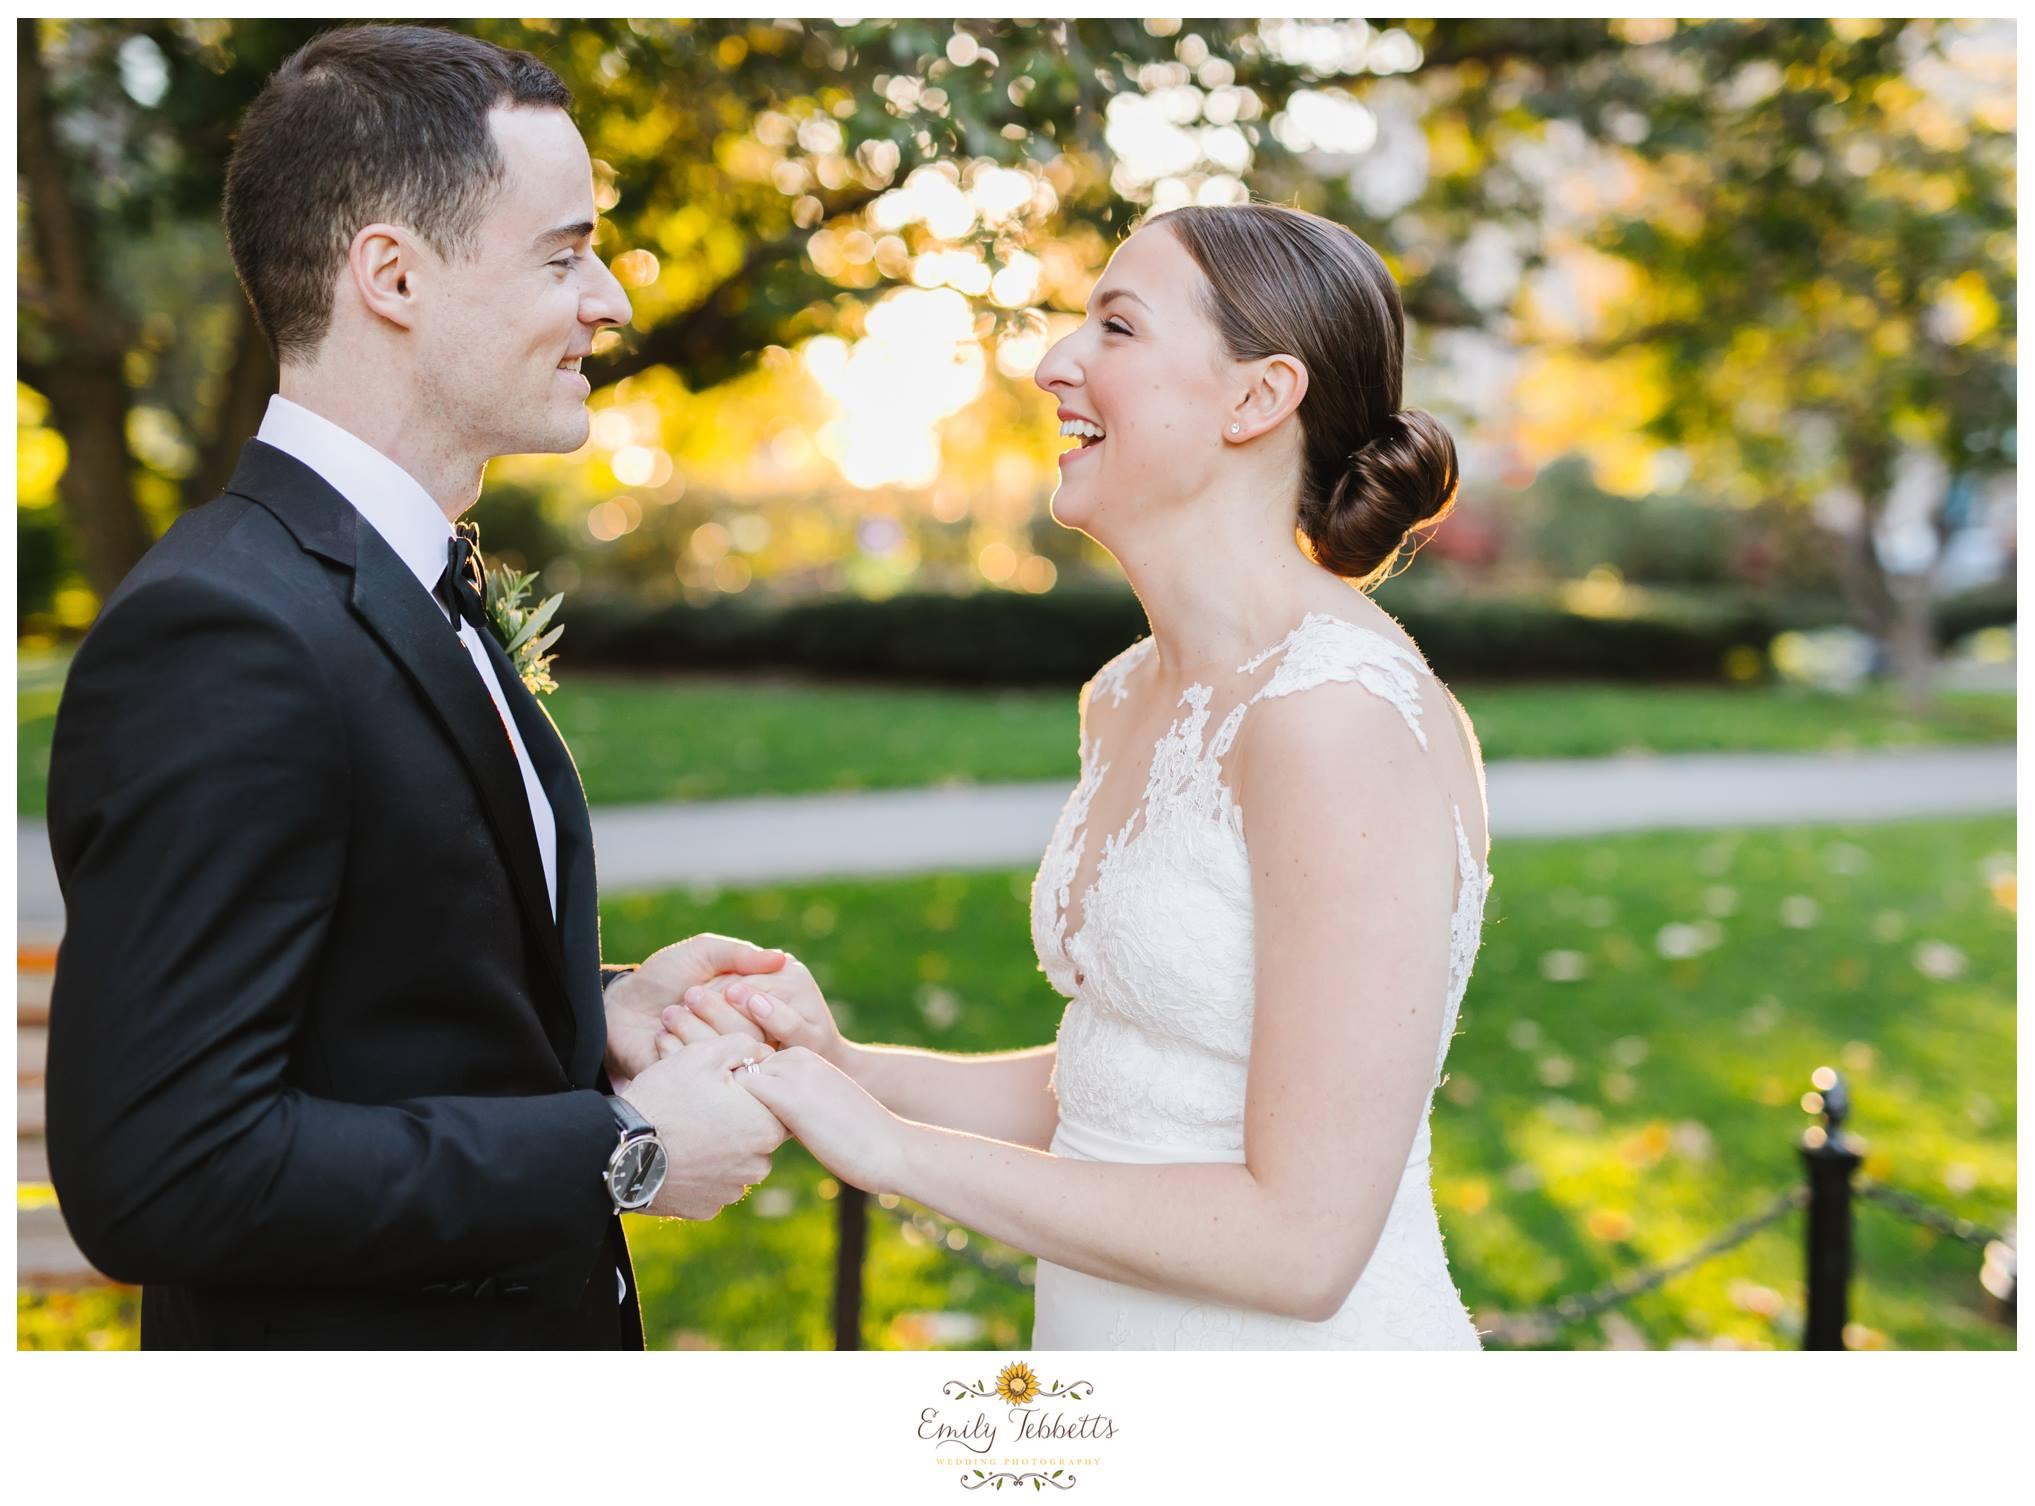 Boston, MA - Emily Tebbetts Wedding Photography 3.jpg